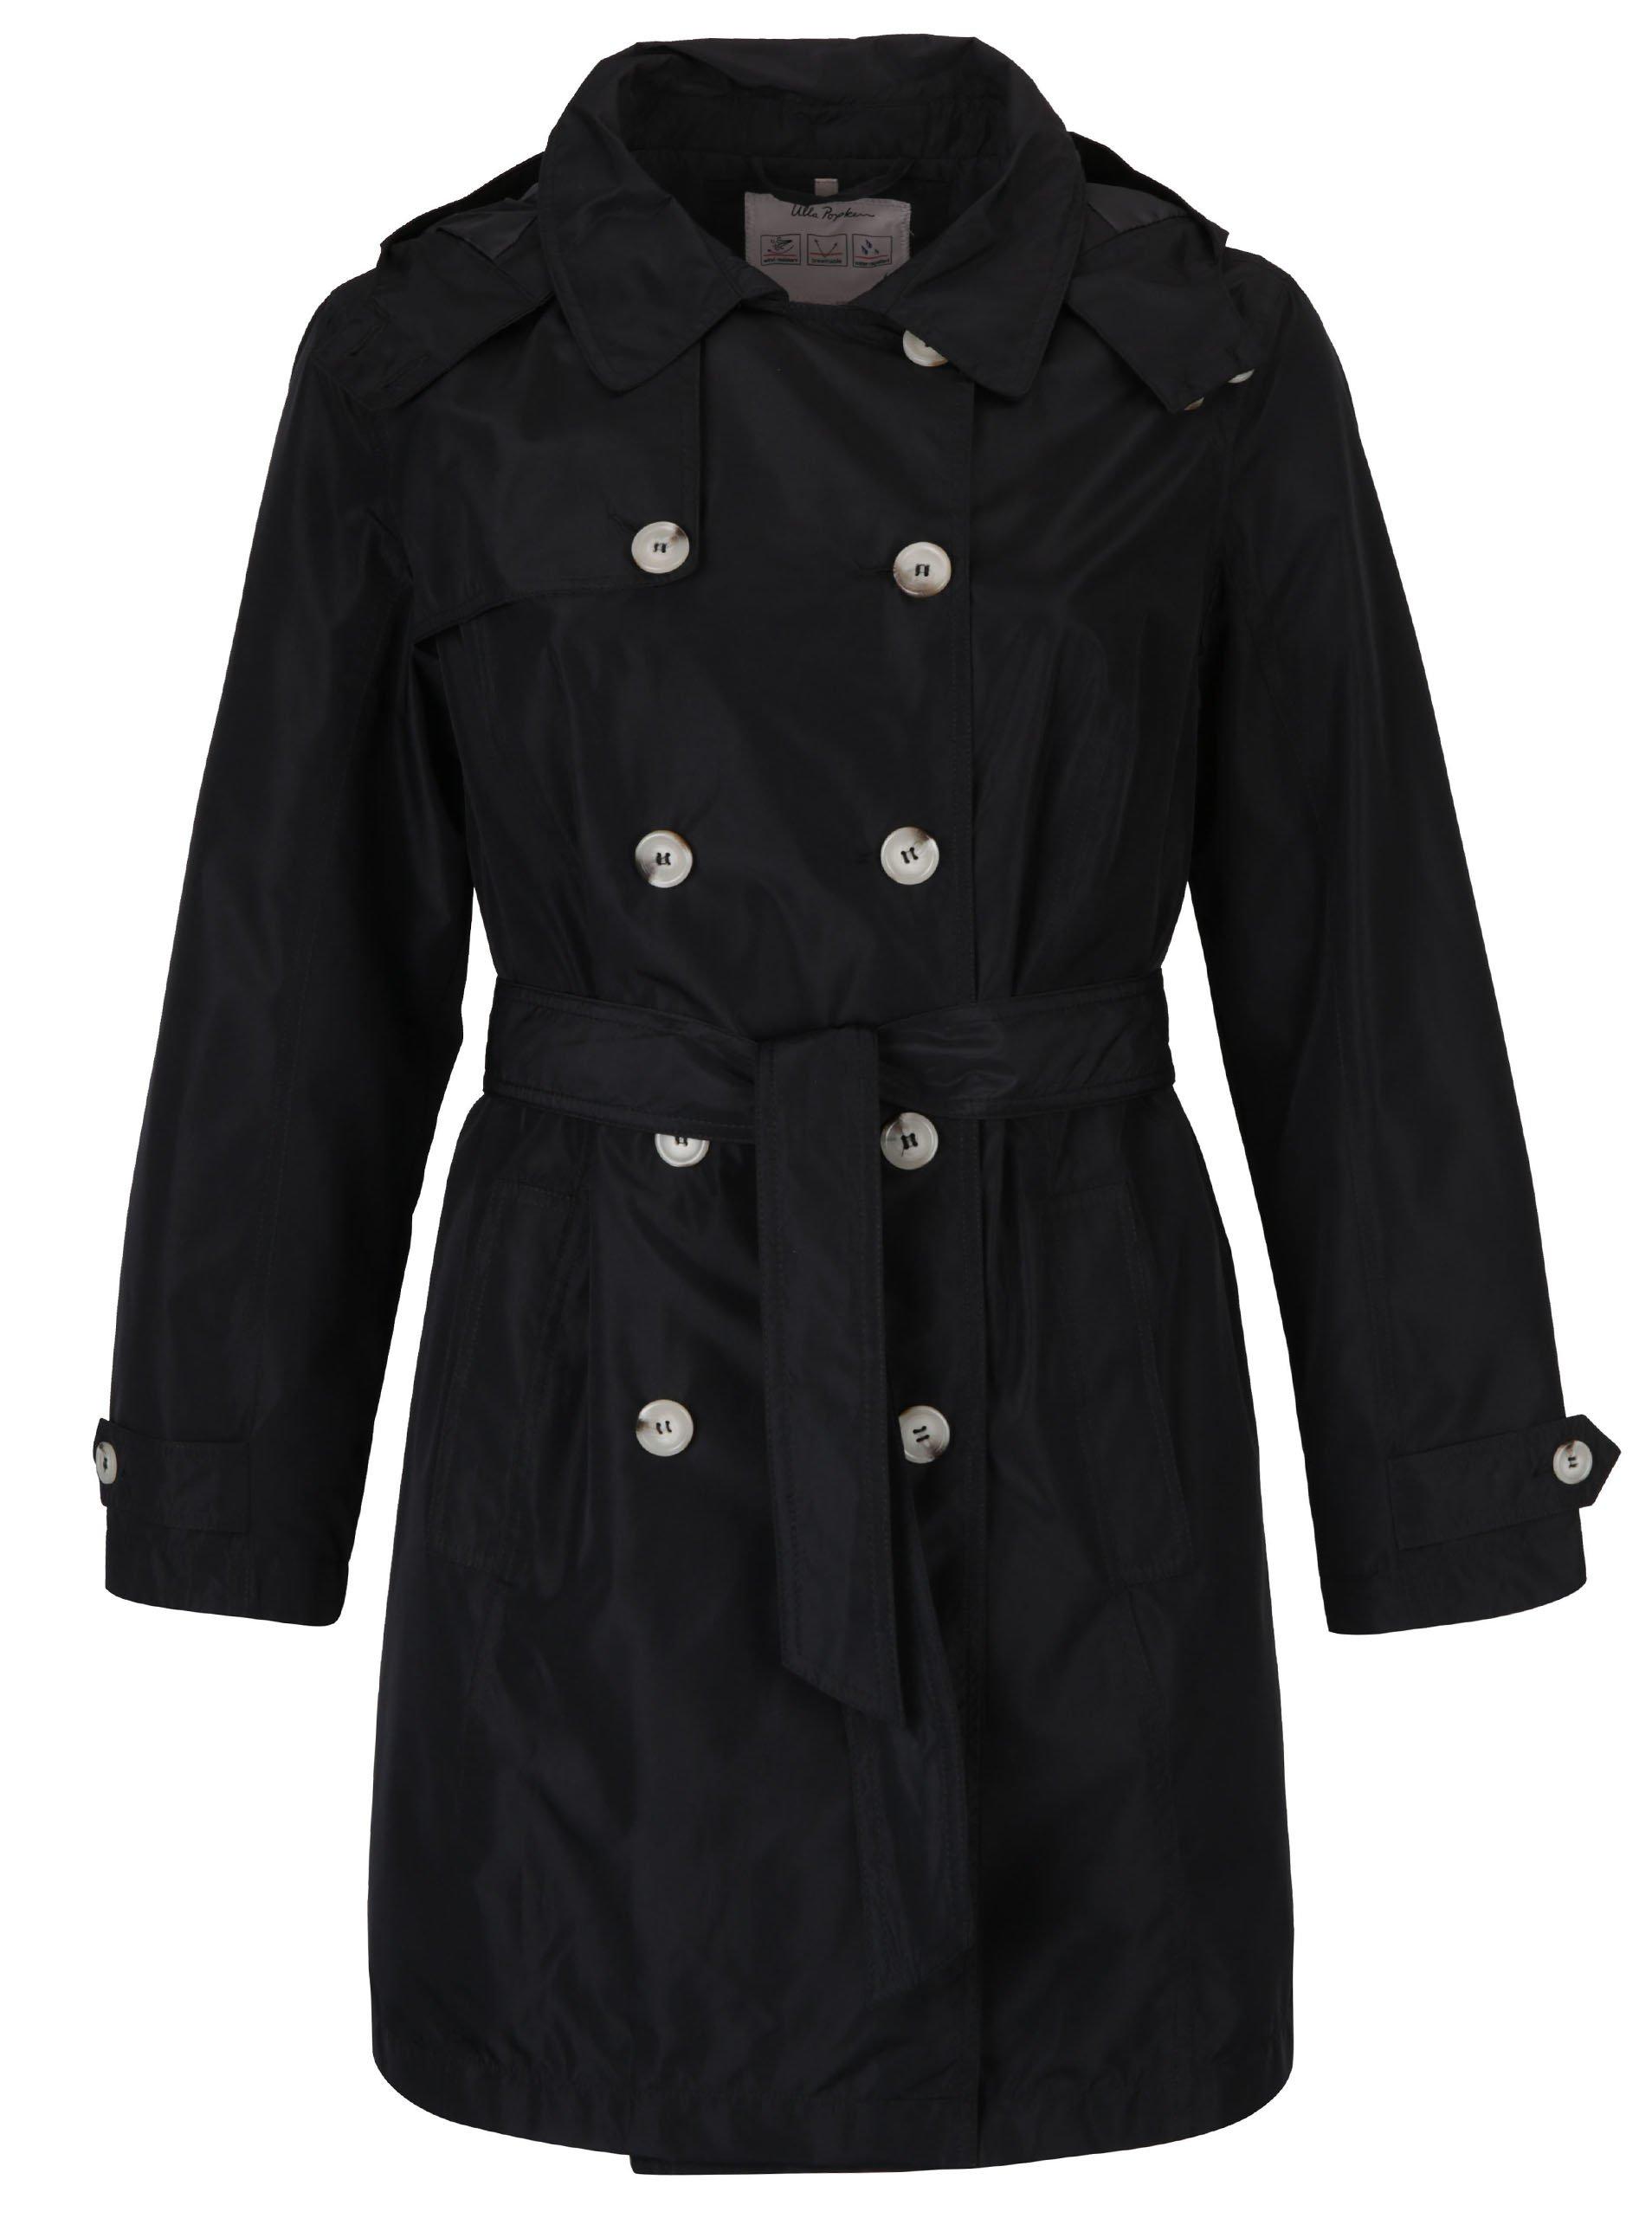 Černý lehký kabát Ulla Popken